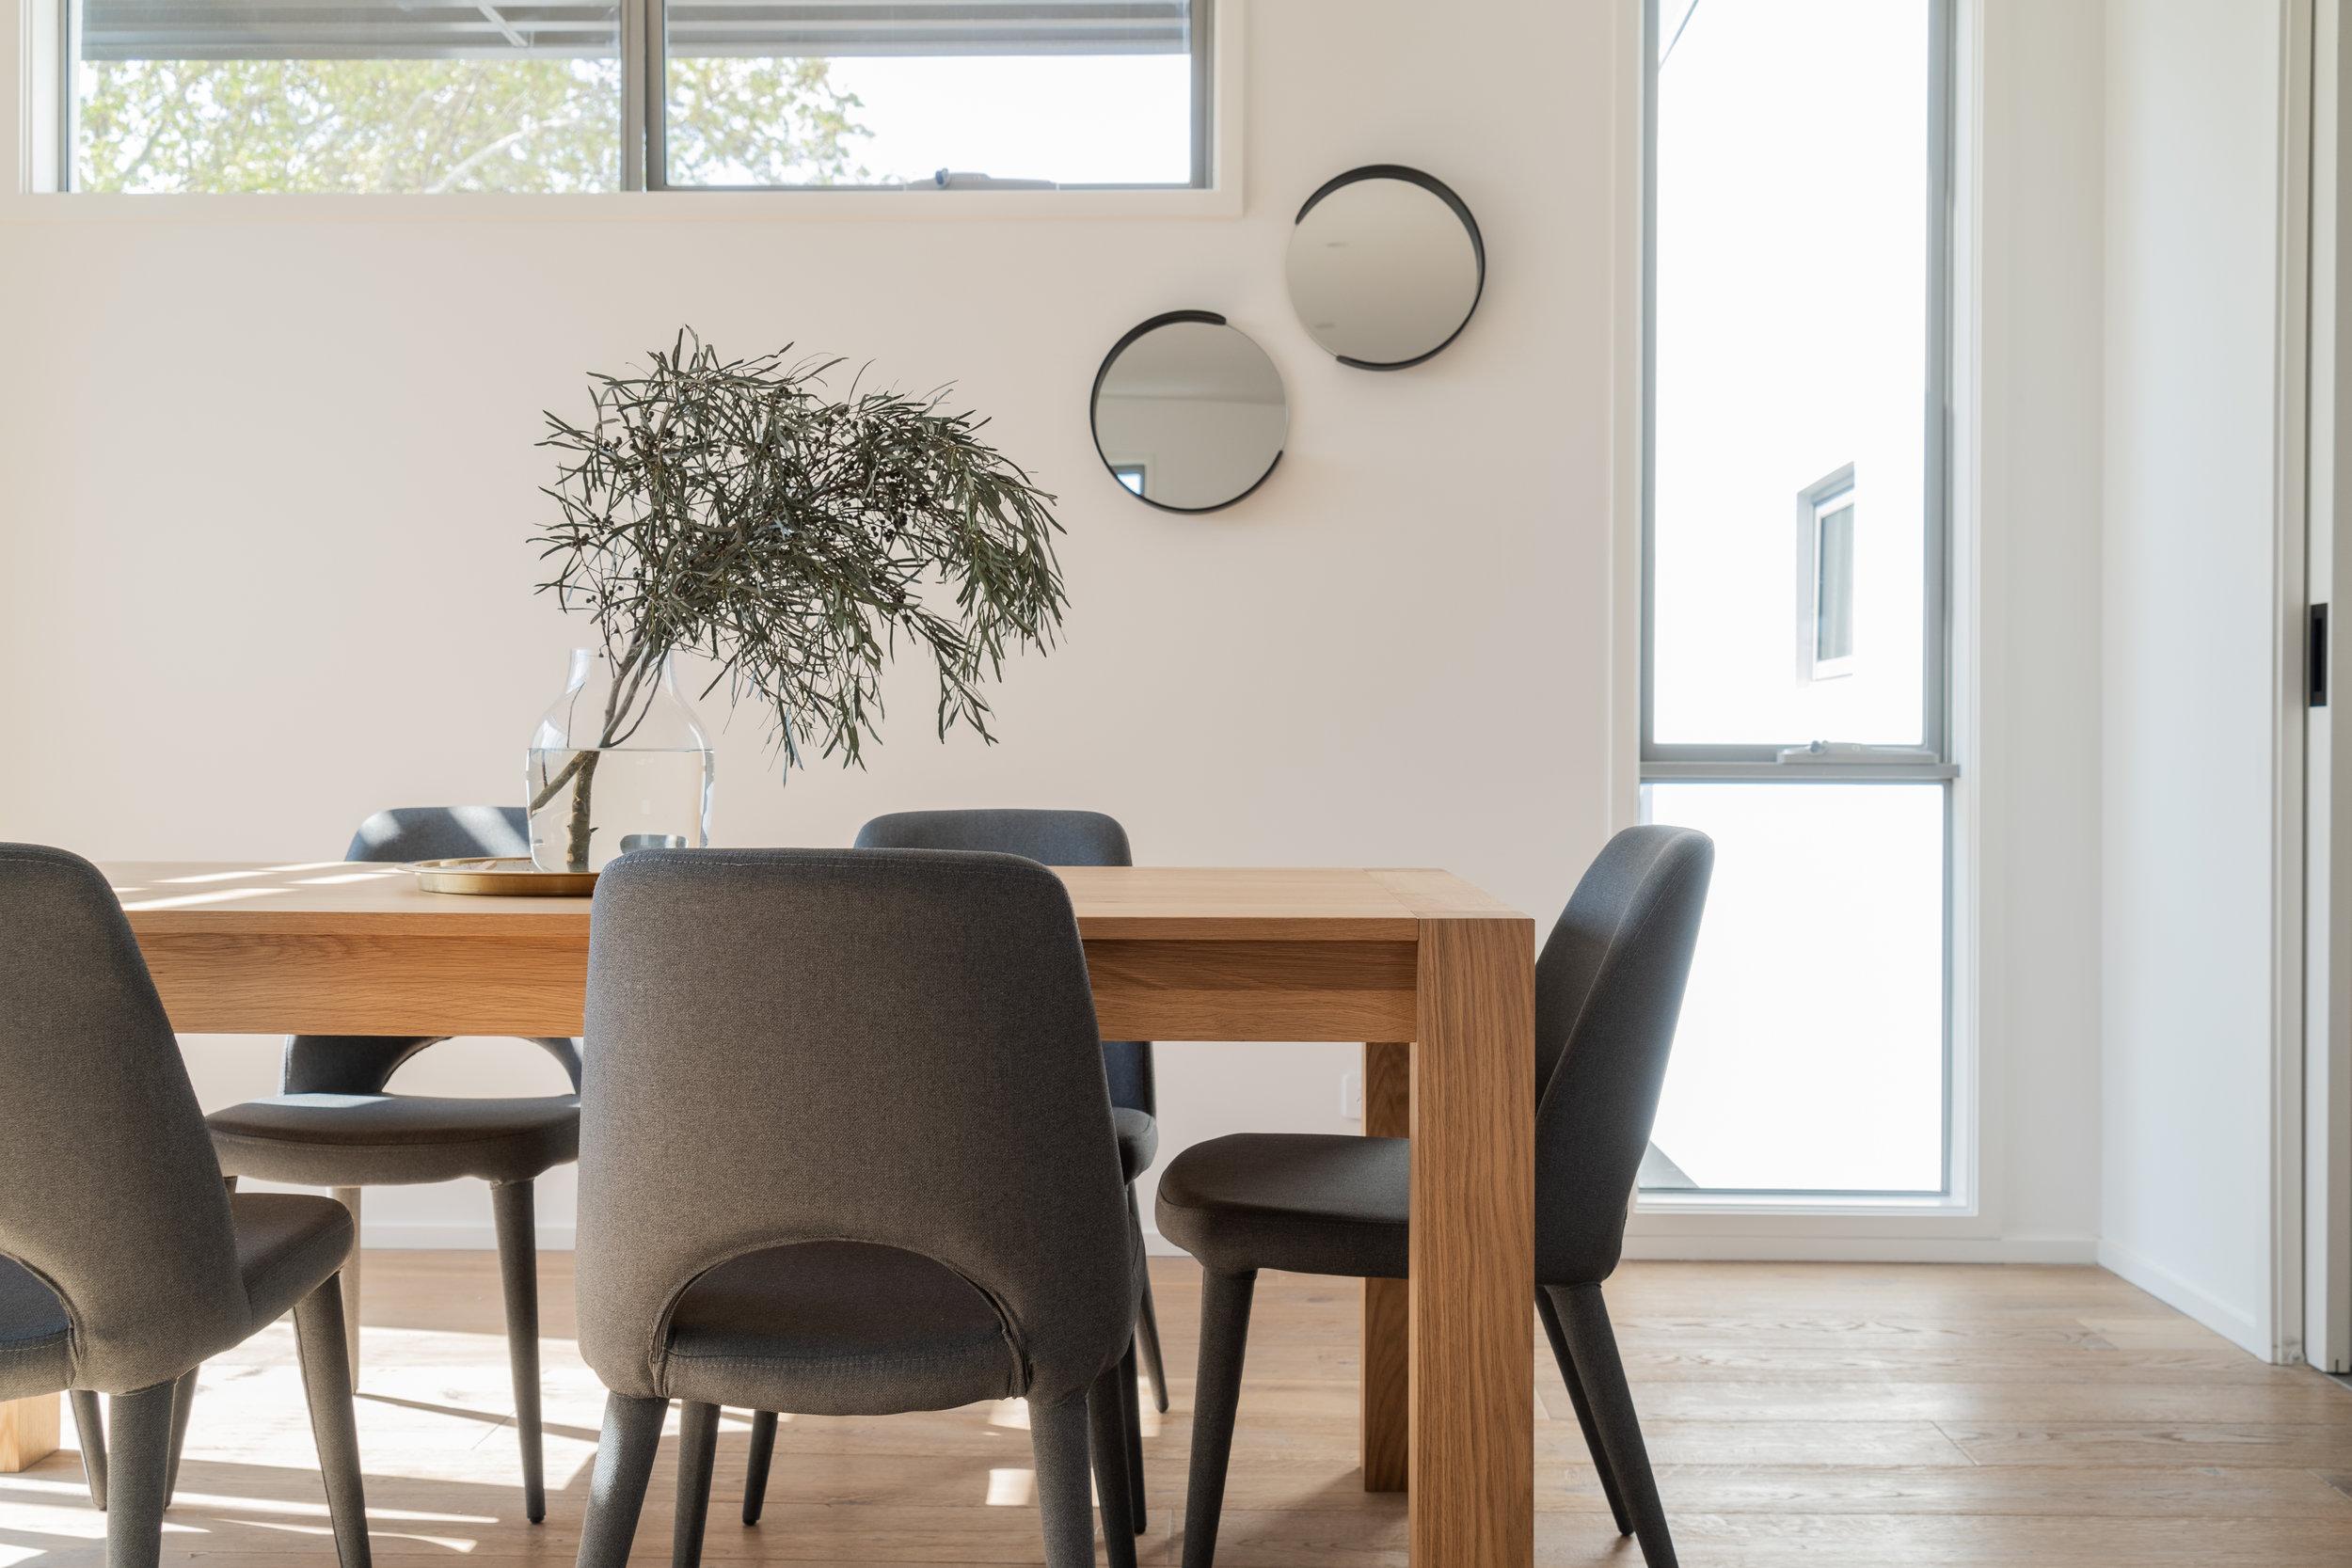 Buckley Dining Seddon Townhouse Property Styling 1.jpg